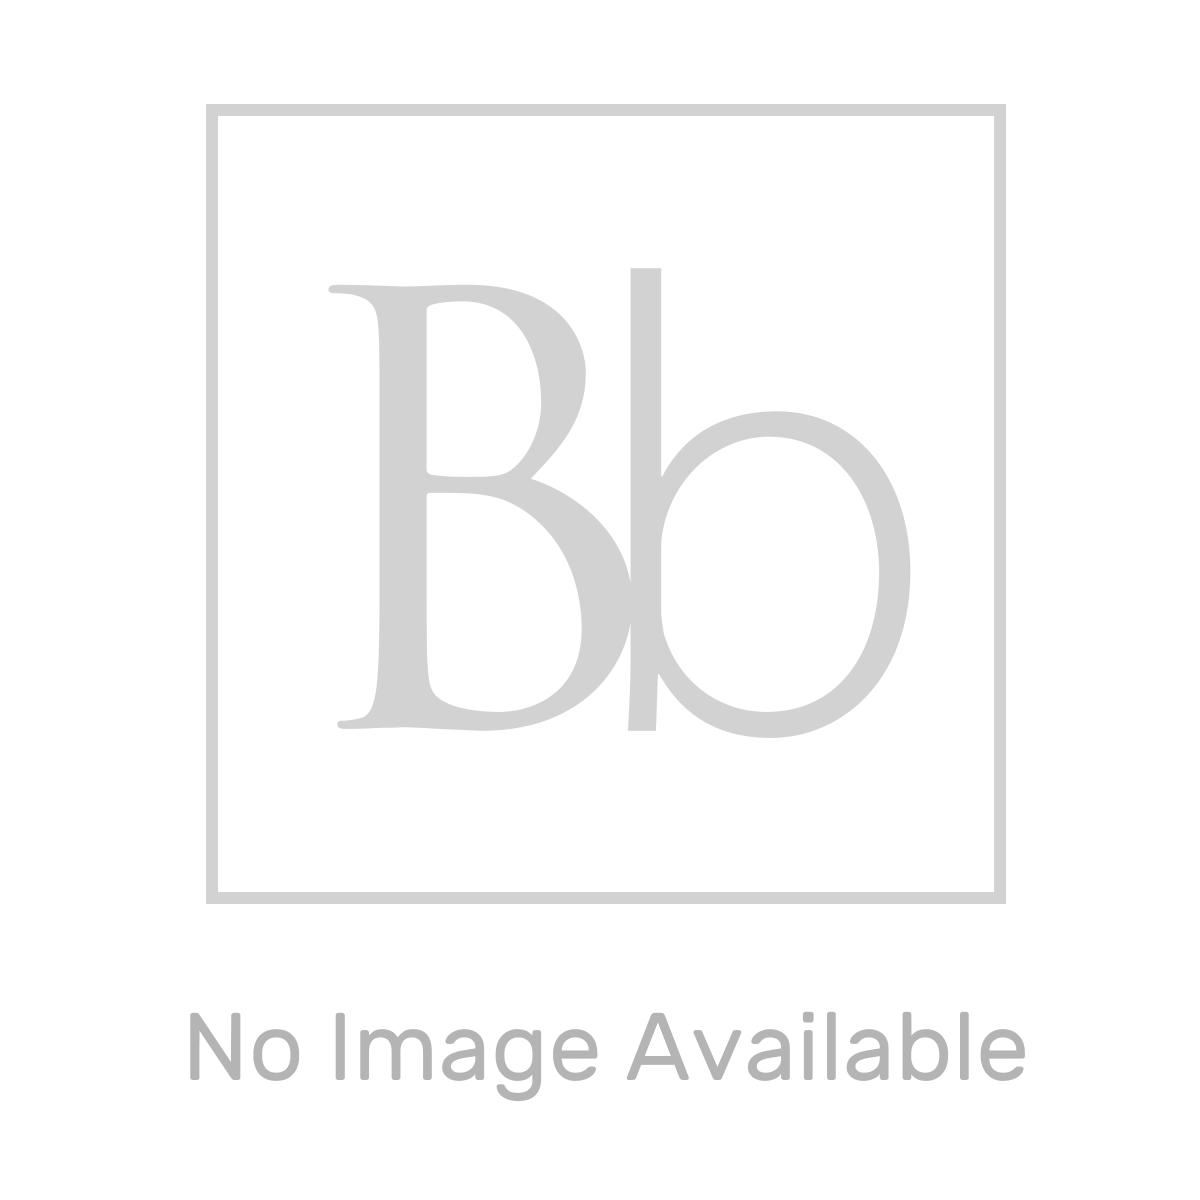 Frontline Aquaglass+ Single Door Quadrant Shower Enclosure